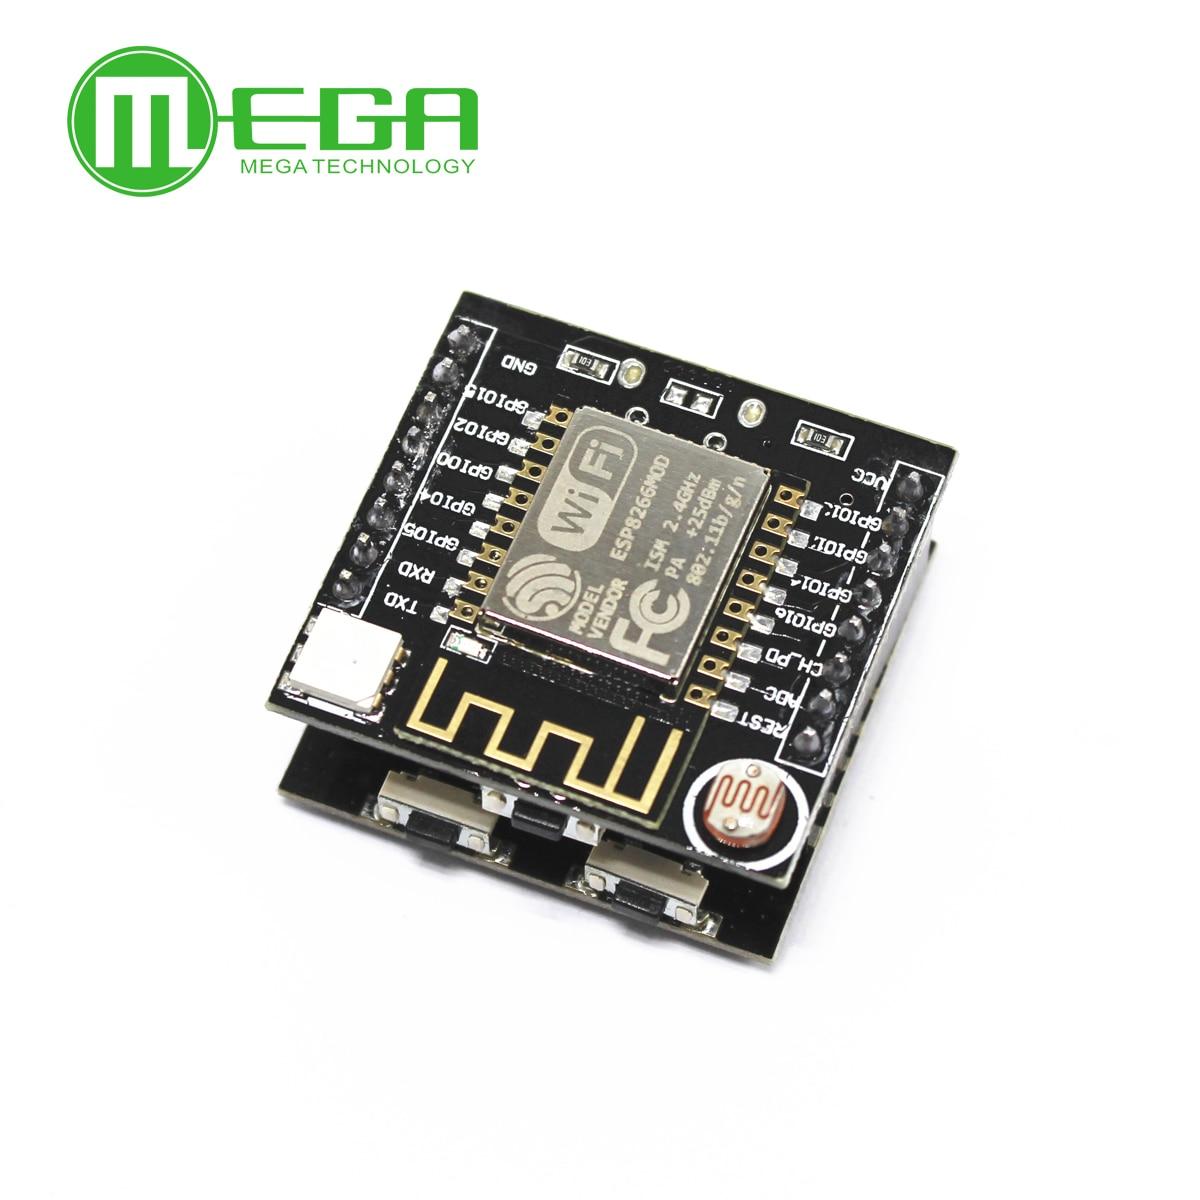 10 шт. ESP8266 серийный WIFI Witty cloud Development Board ESP-12F Модуль MINI nodemcu